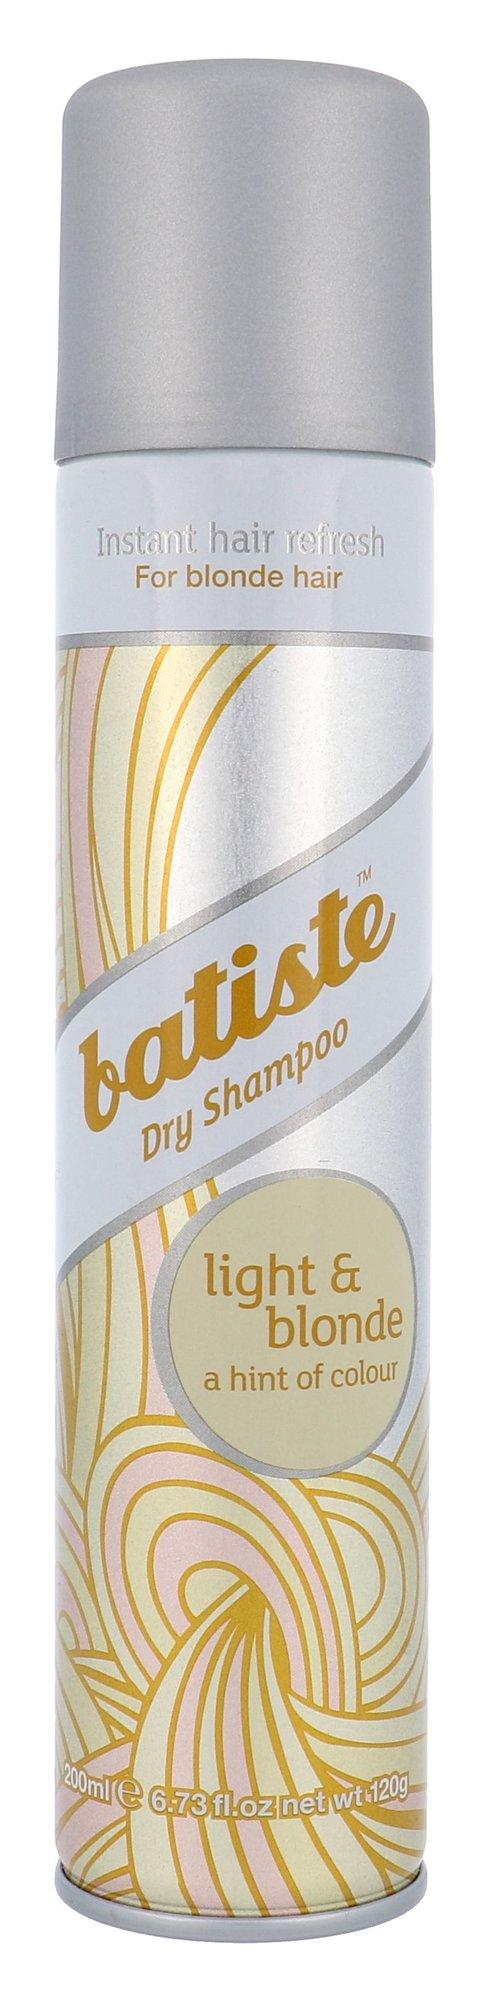 Batiste Brilliant Blonde Cosmetic 200ml